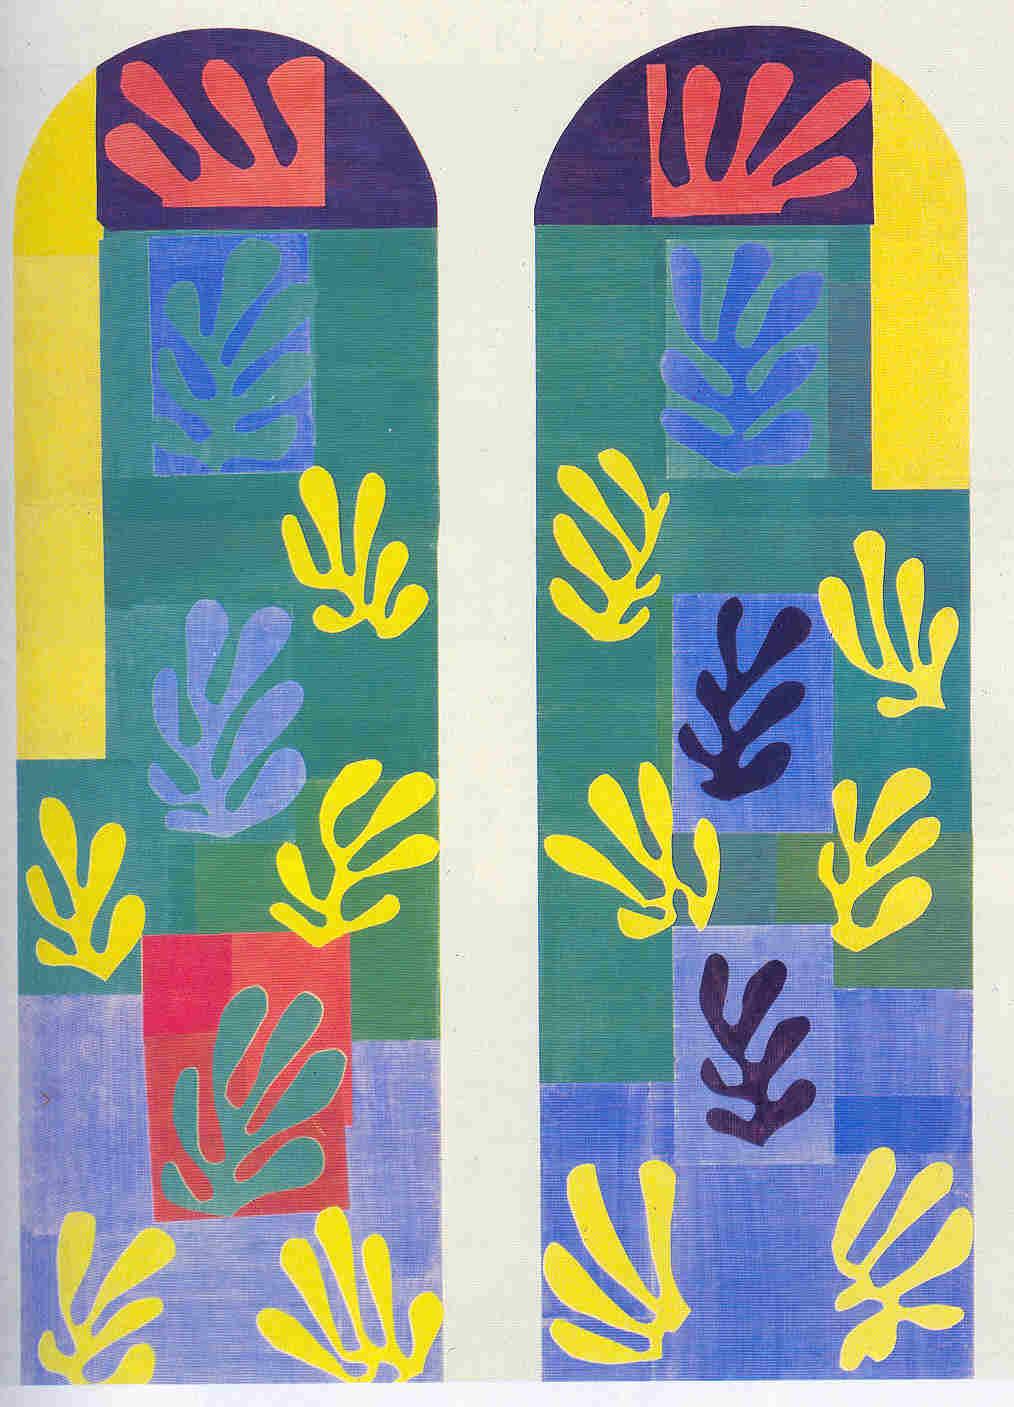 Fabuleux Matisse,danse 3e | garrus art DQ51